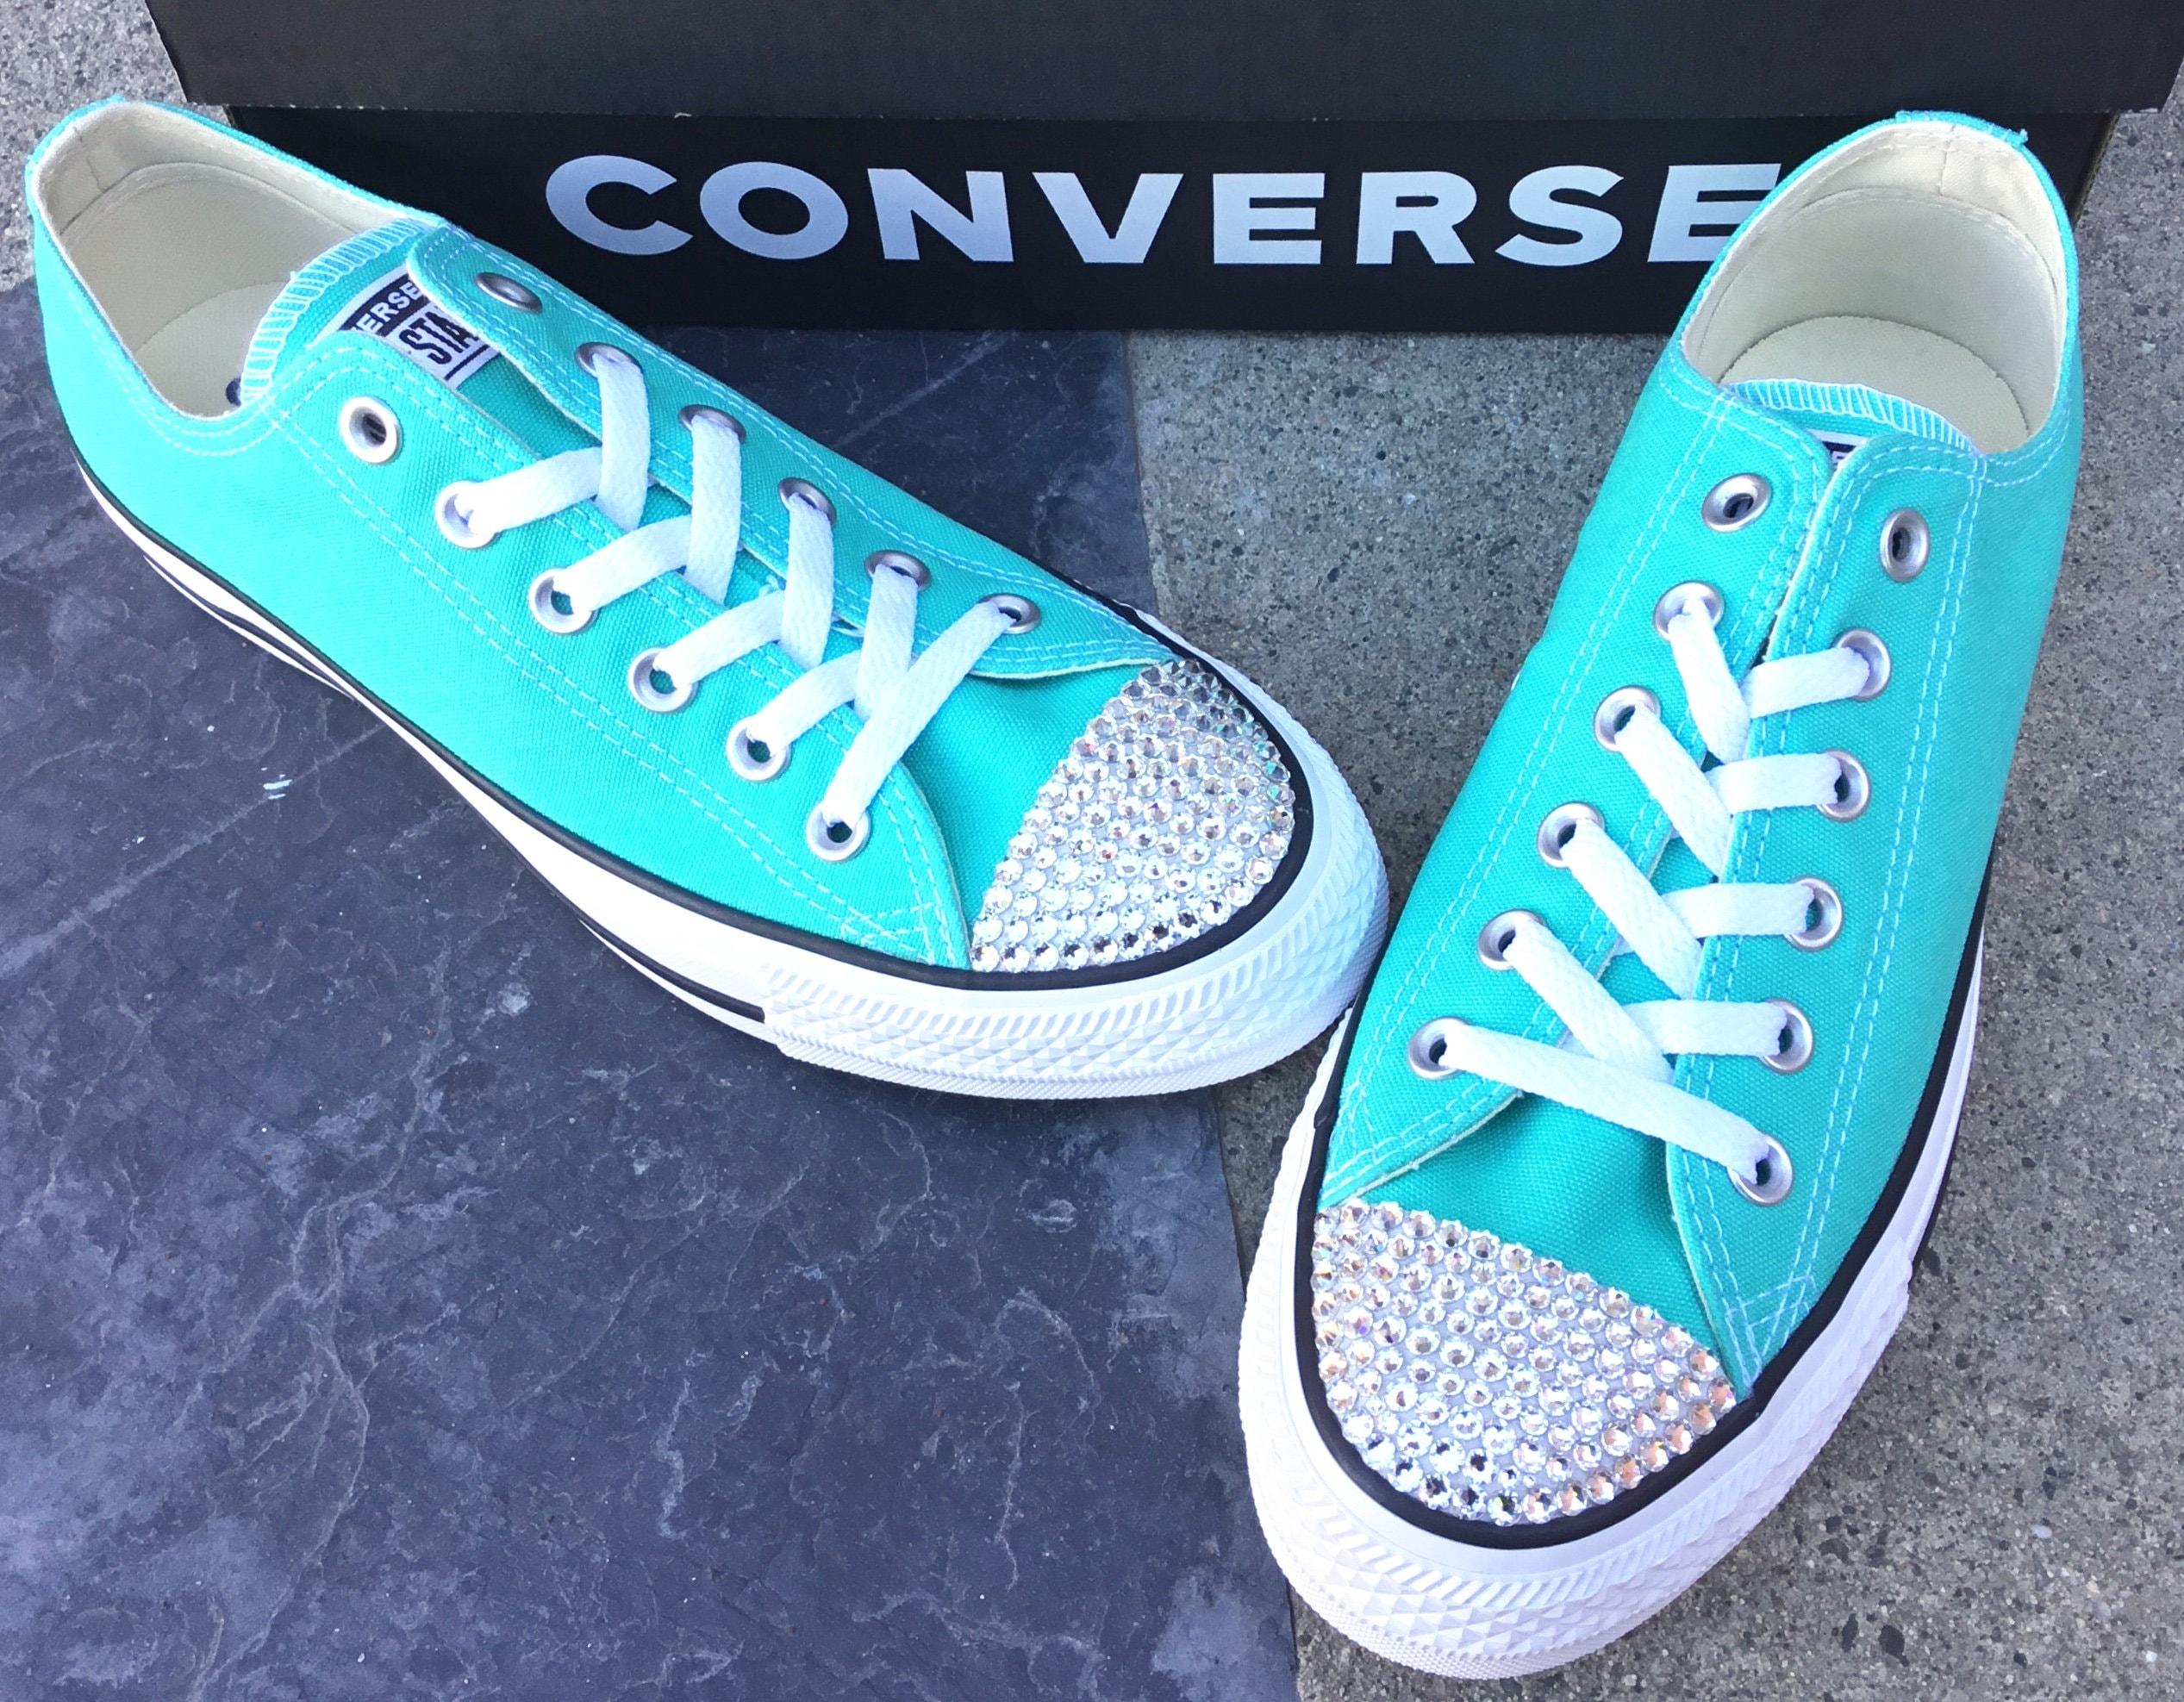 Aqua Blue Converse Low Top Turquoise Pure Teal Custom w/ Swarovski ...